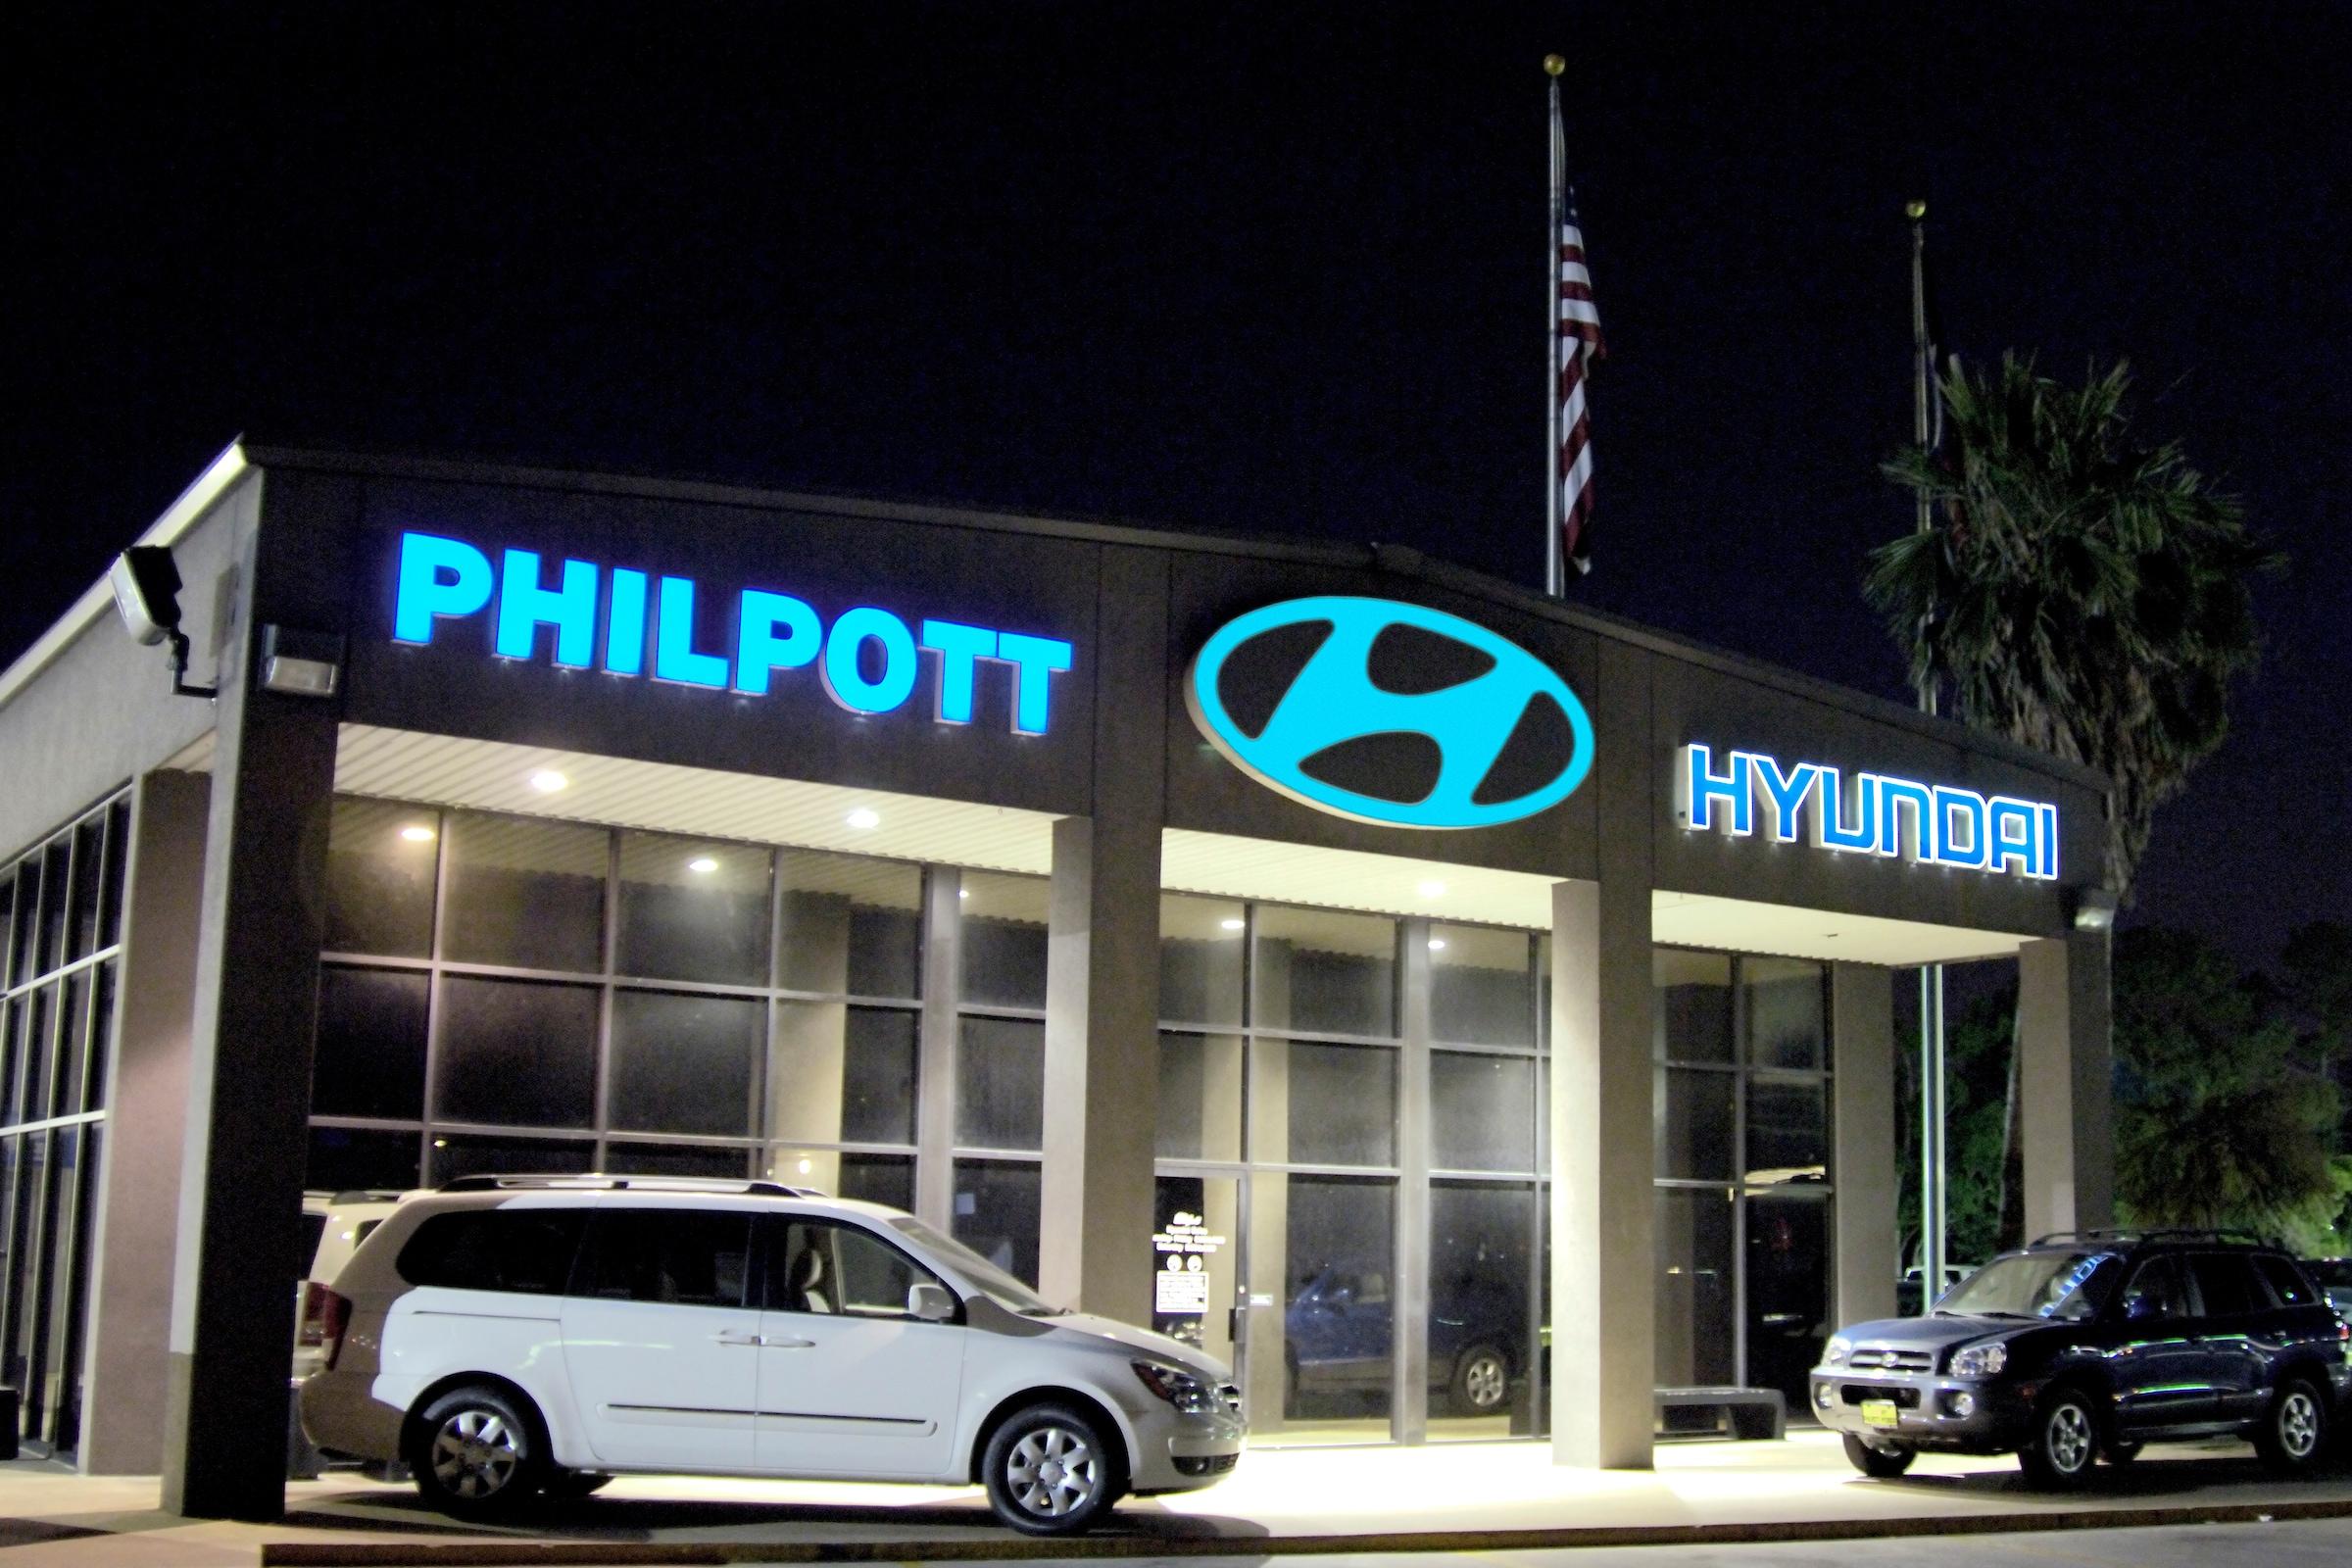 About philpott hyundai your beaumont area hyundai dealership